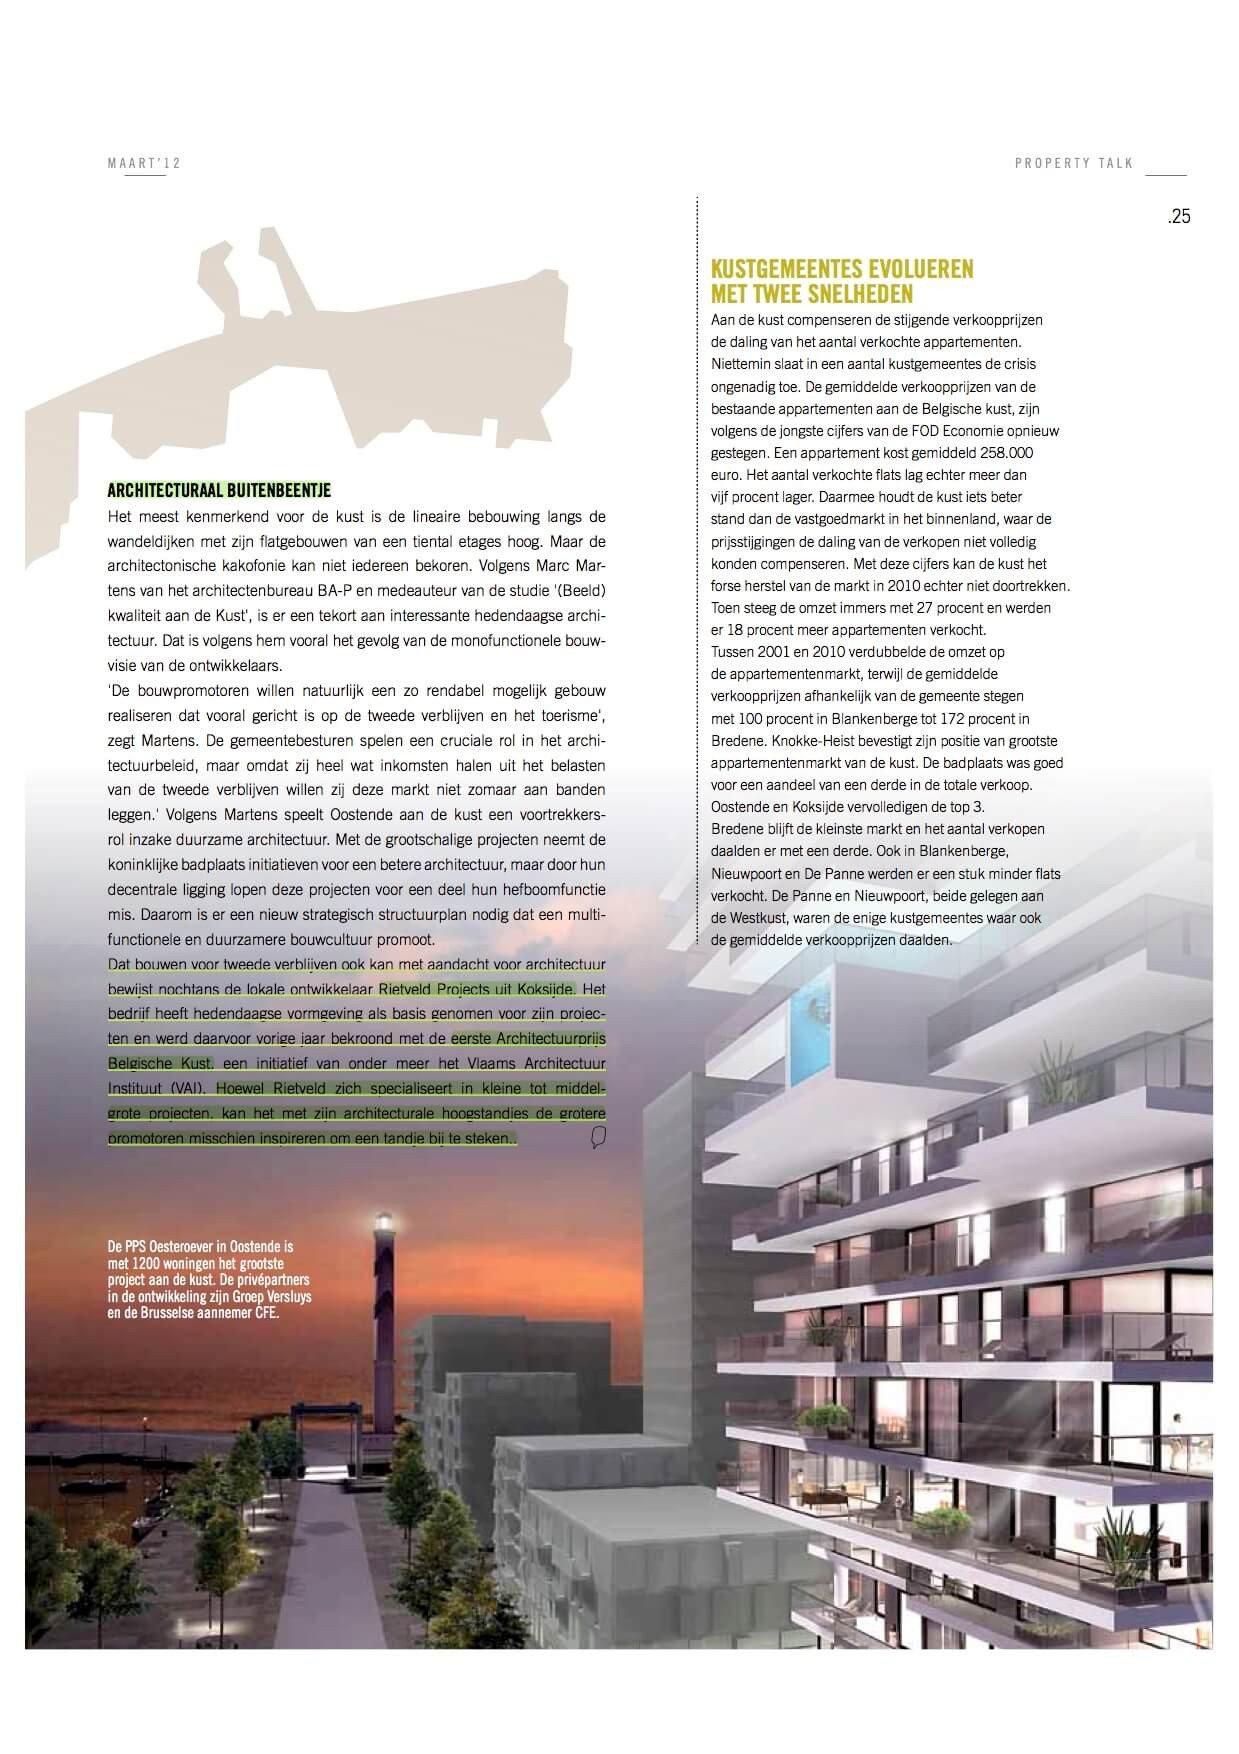 Property Talk - Rietveldprojects 2